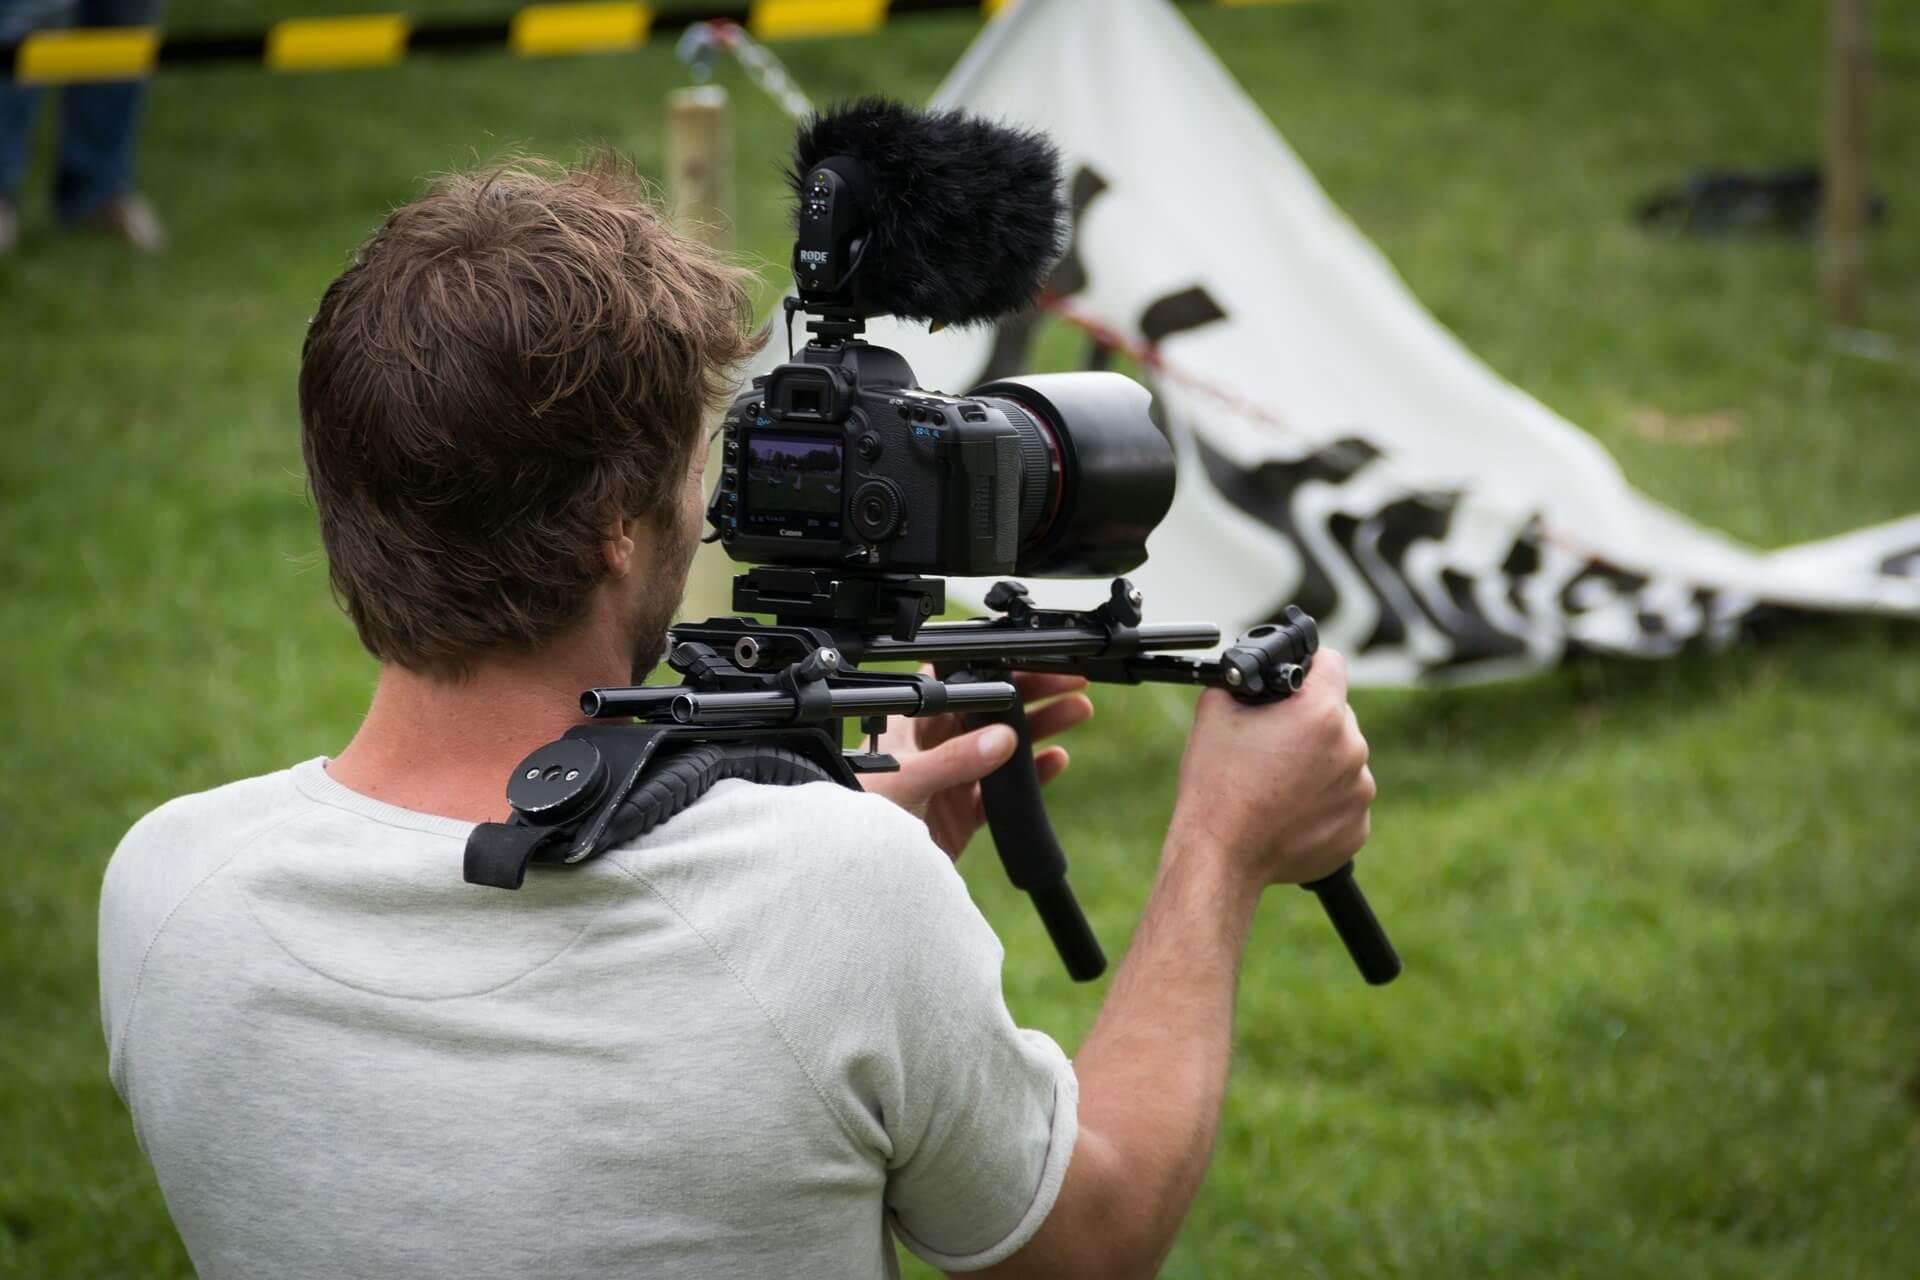 Kameramann auf Grünfläche